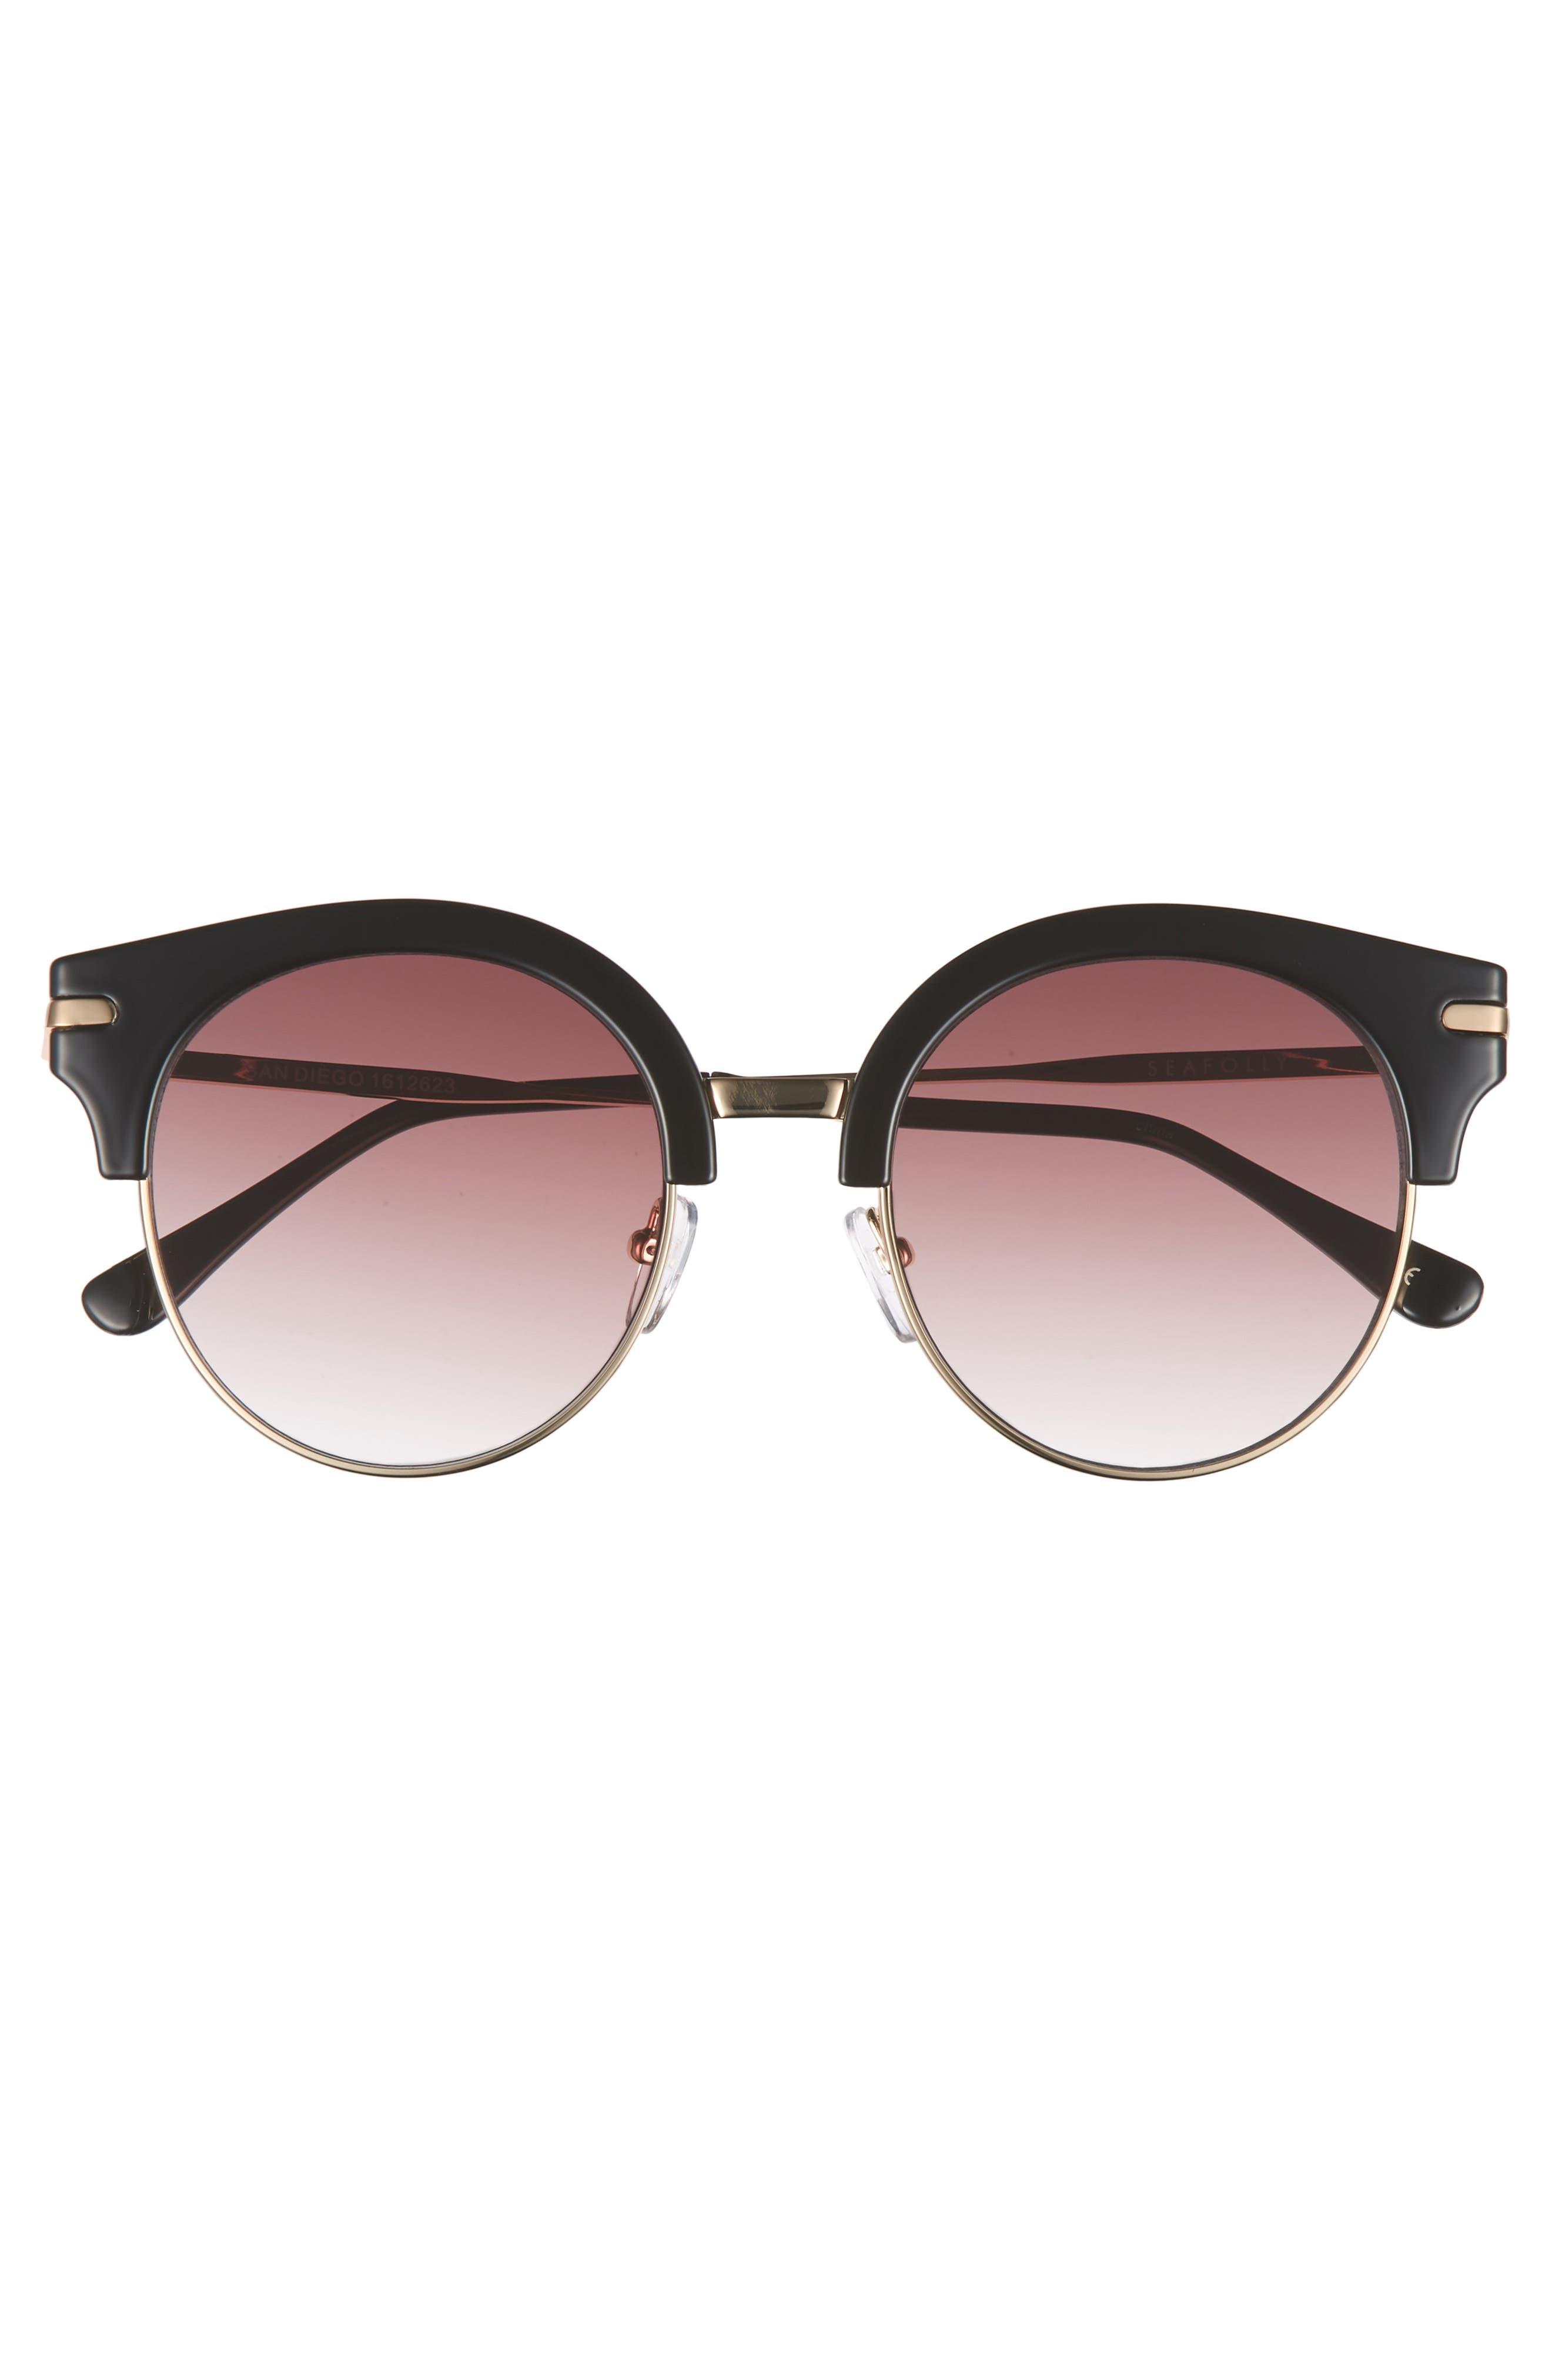 San Diego 52mm Cat Eye Sunglasses,                             Alternate thumbnail 3, color,                             Black